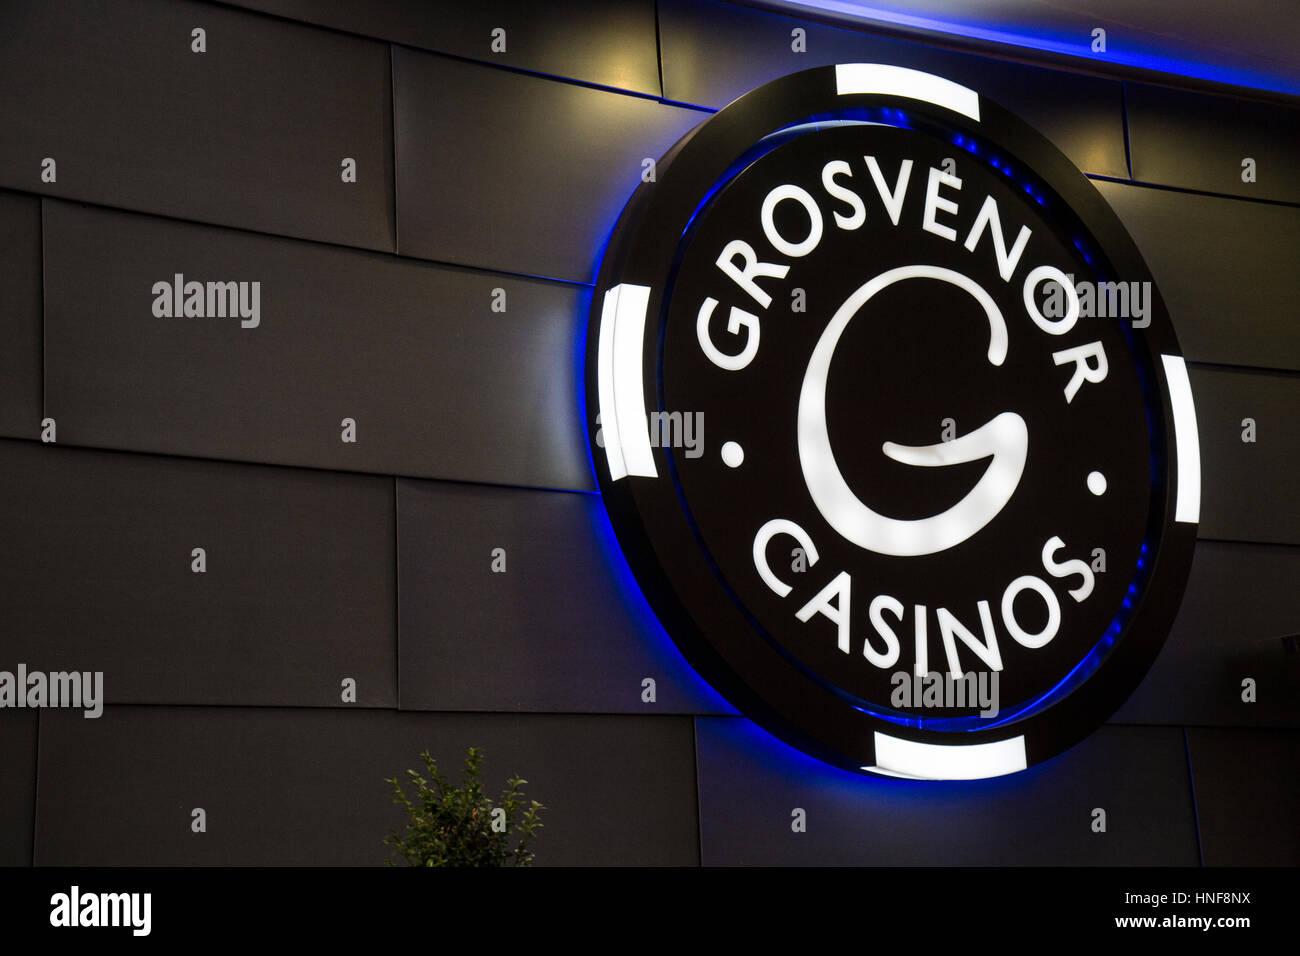 grosvenor casino edgware road london